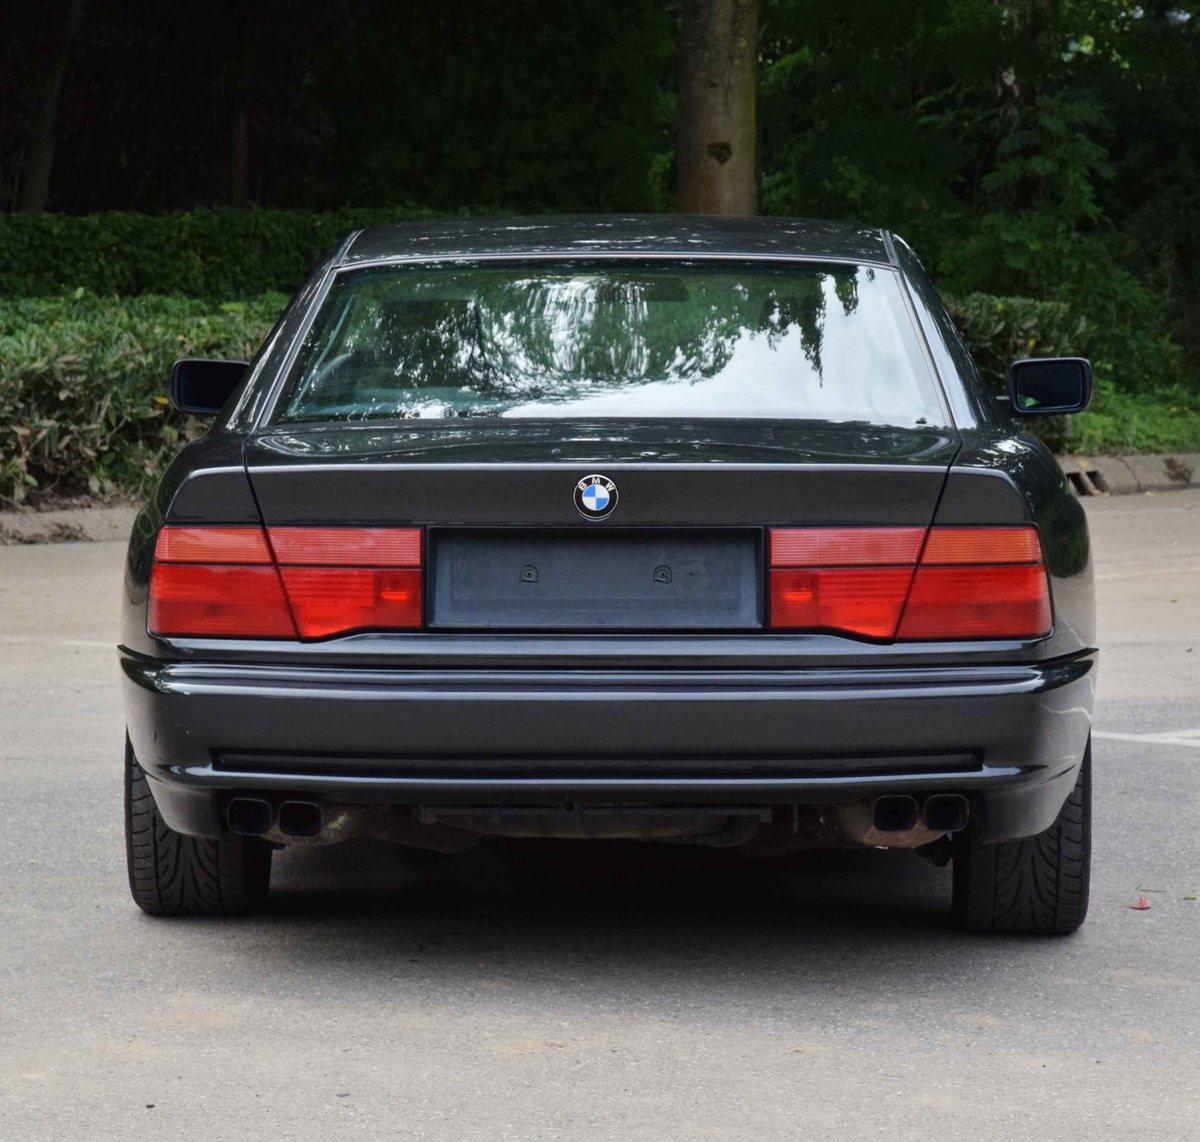 1993 BMW 850i Coupé diamond black 5000cc sports car For Sale (picture 5 of 6)